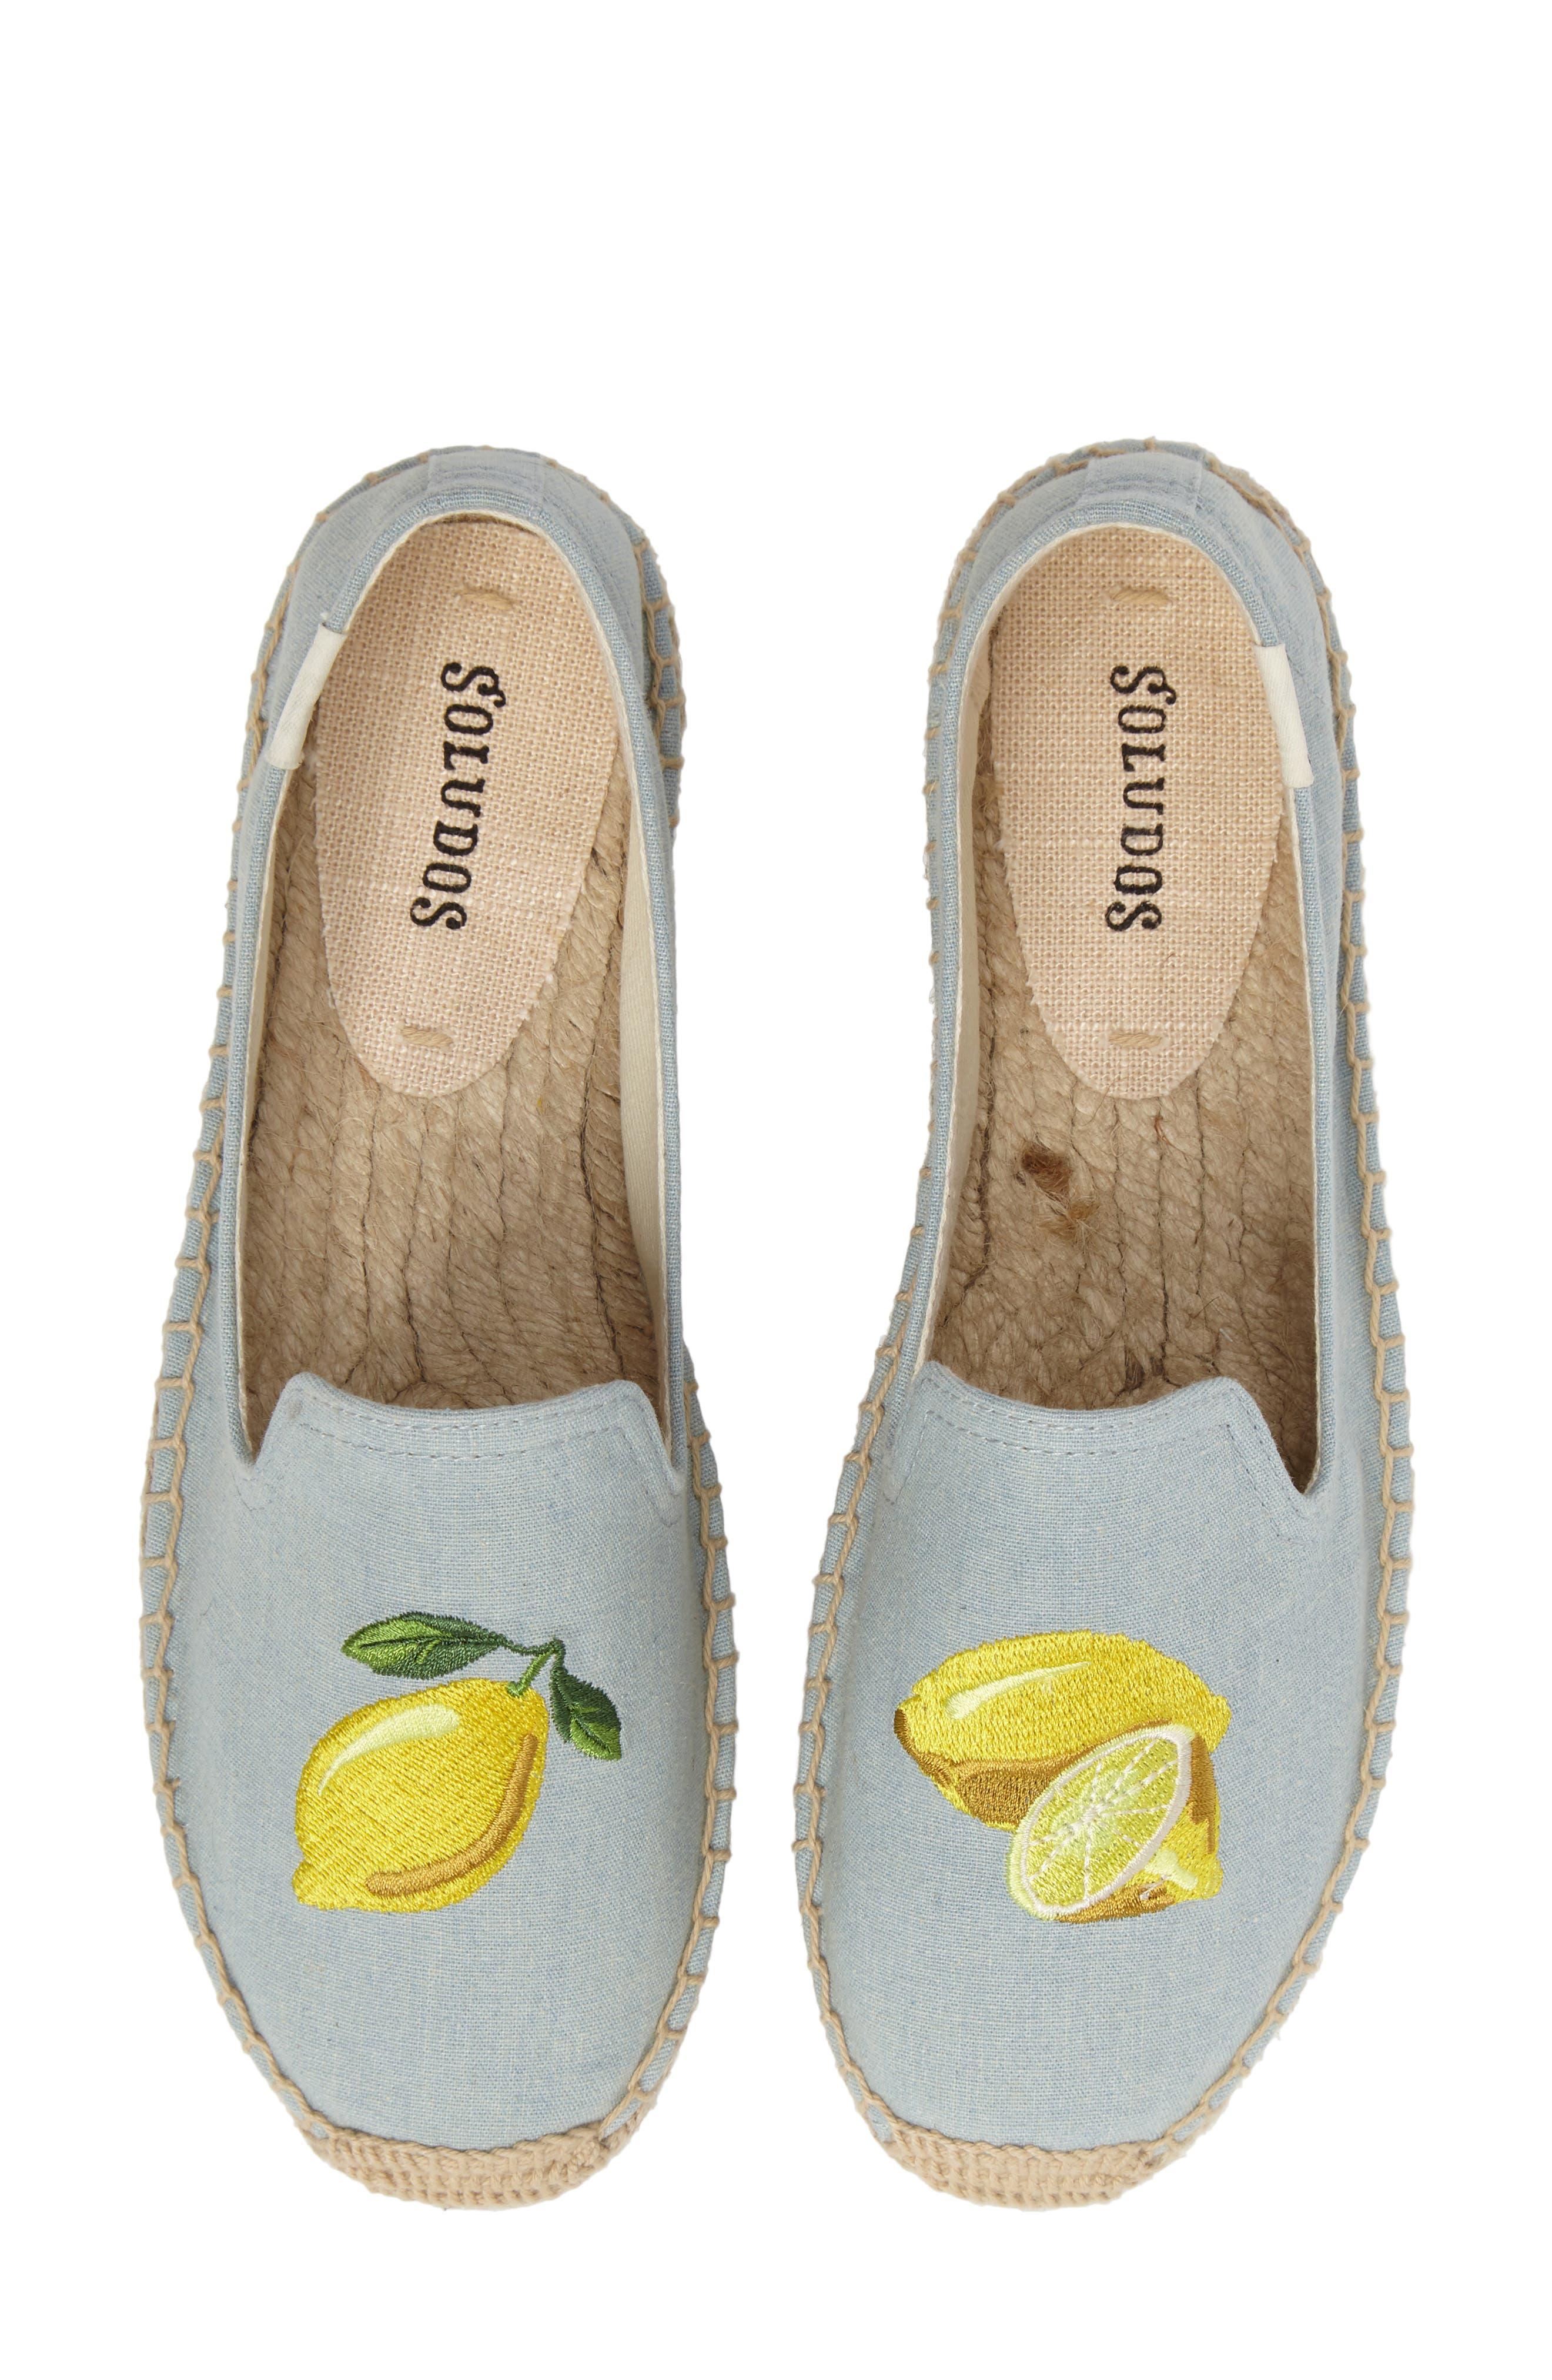 Alternate Image 1 Selected - Soludos Lemon Espadrille Flat (Women)